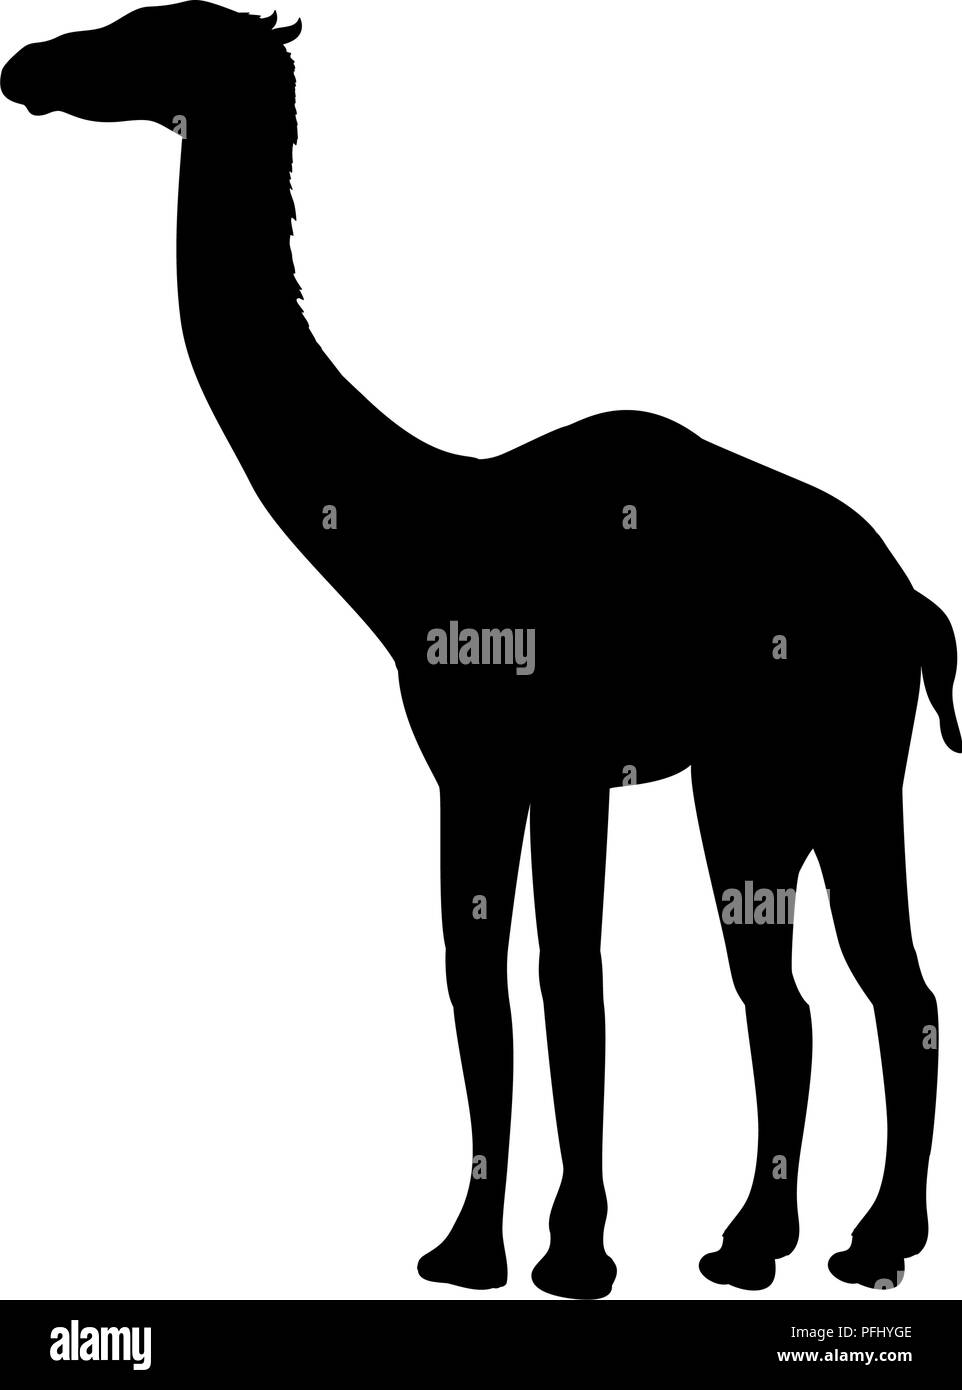 Aepycamelus prehistoric camel silhouette extinct mammal animal - Stock Image